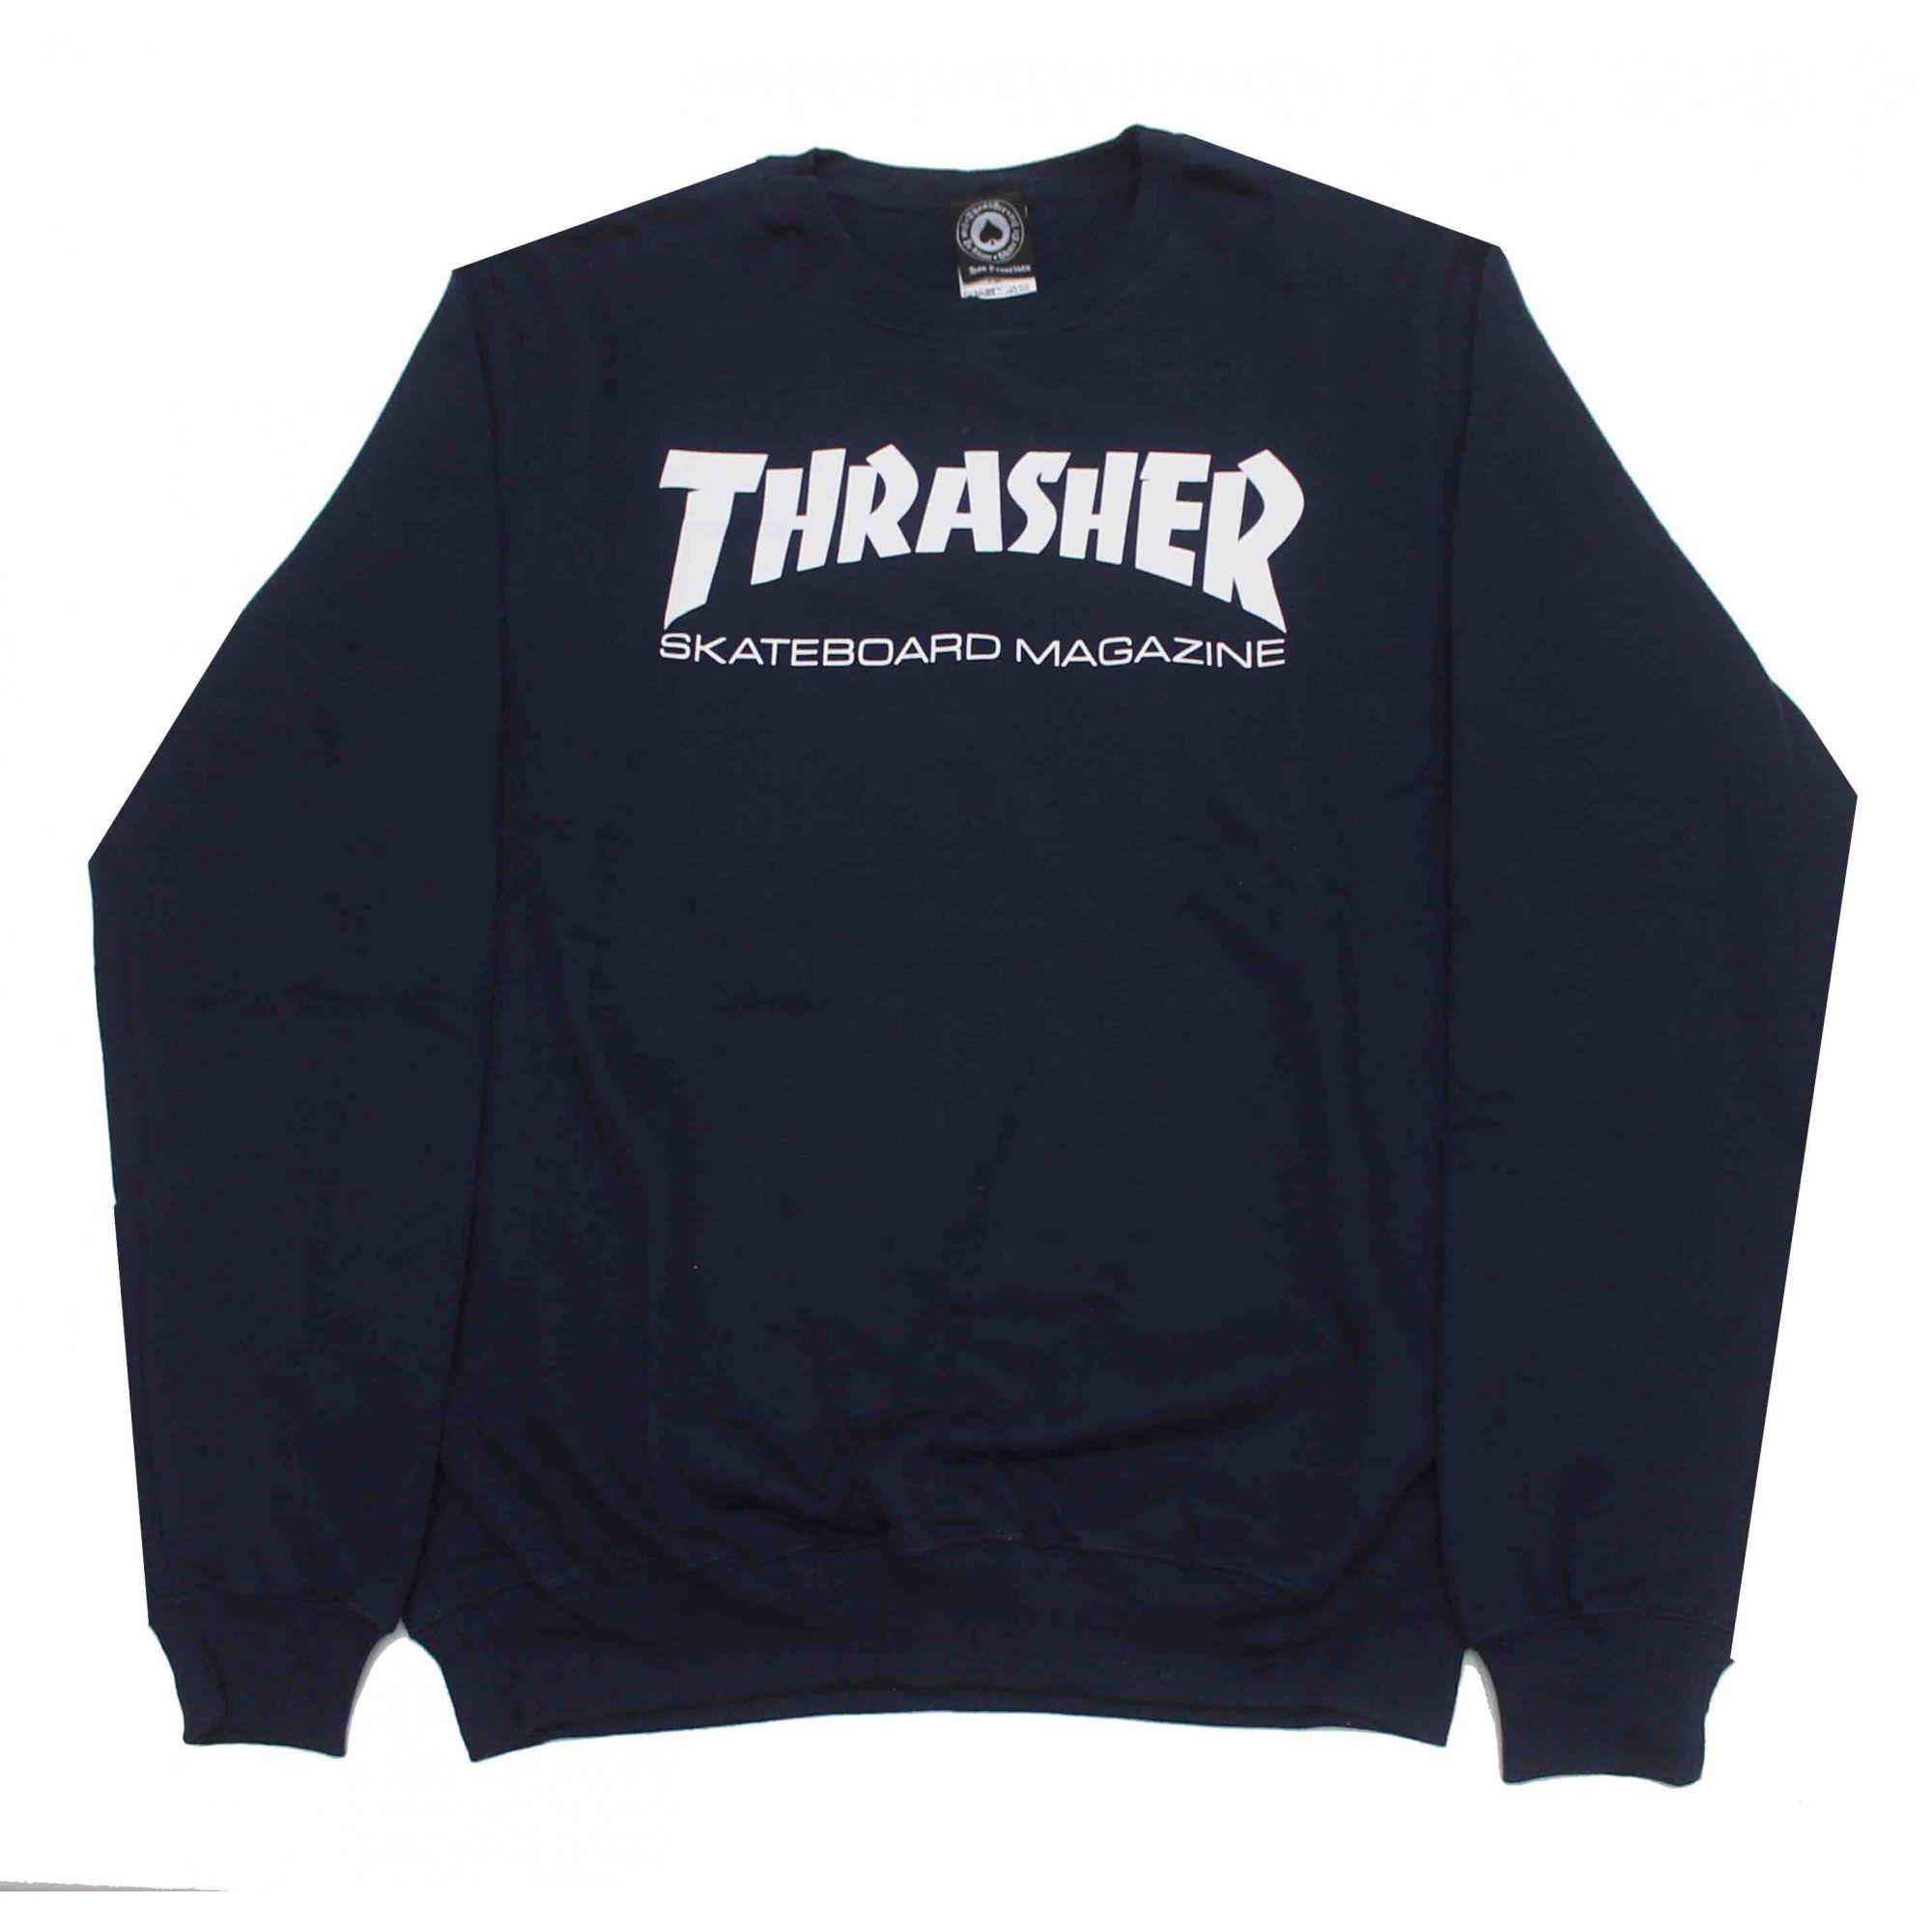 Moletom Thrasher Magazine Careca Skate Mag Azul Marinho